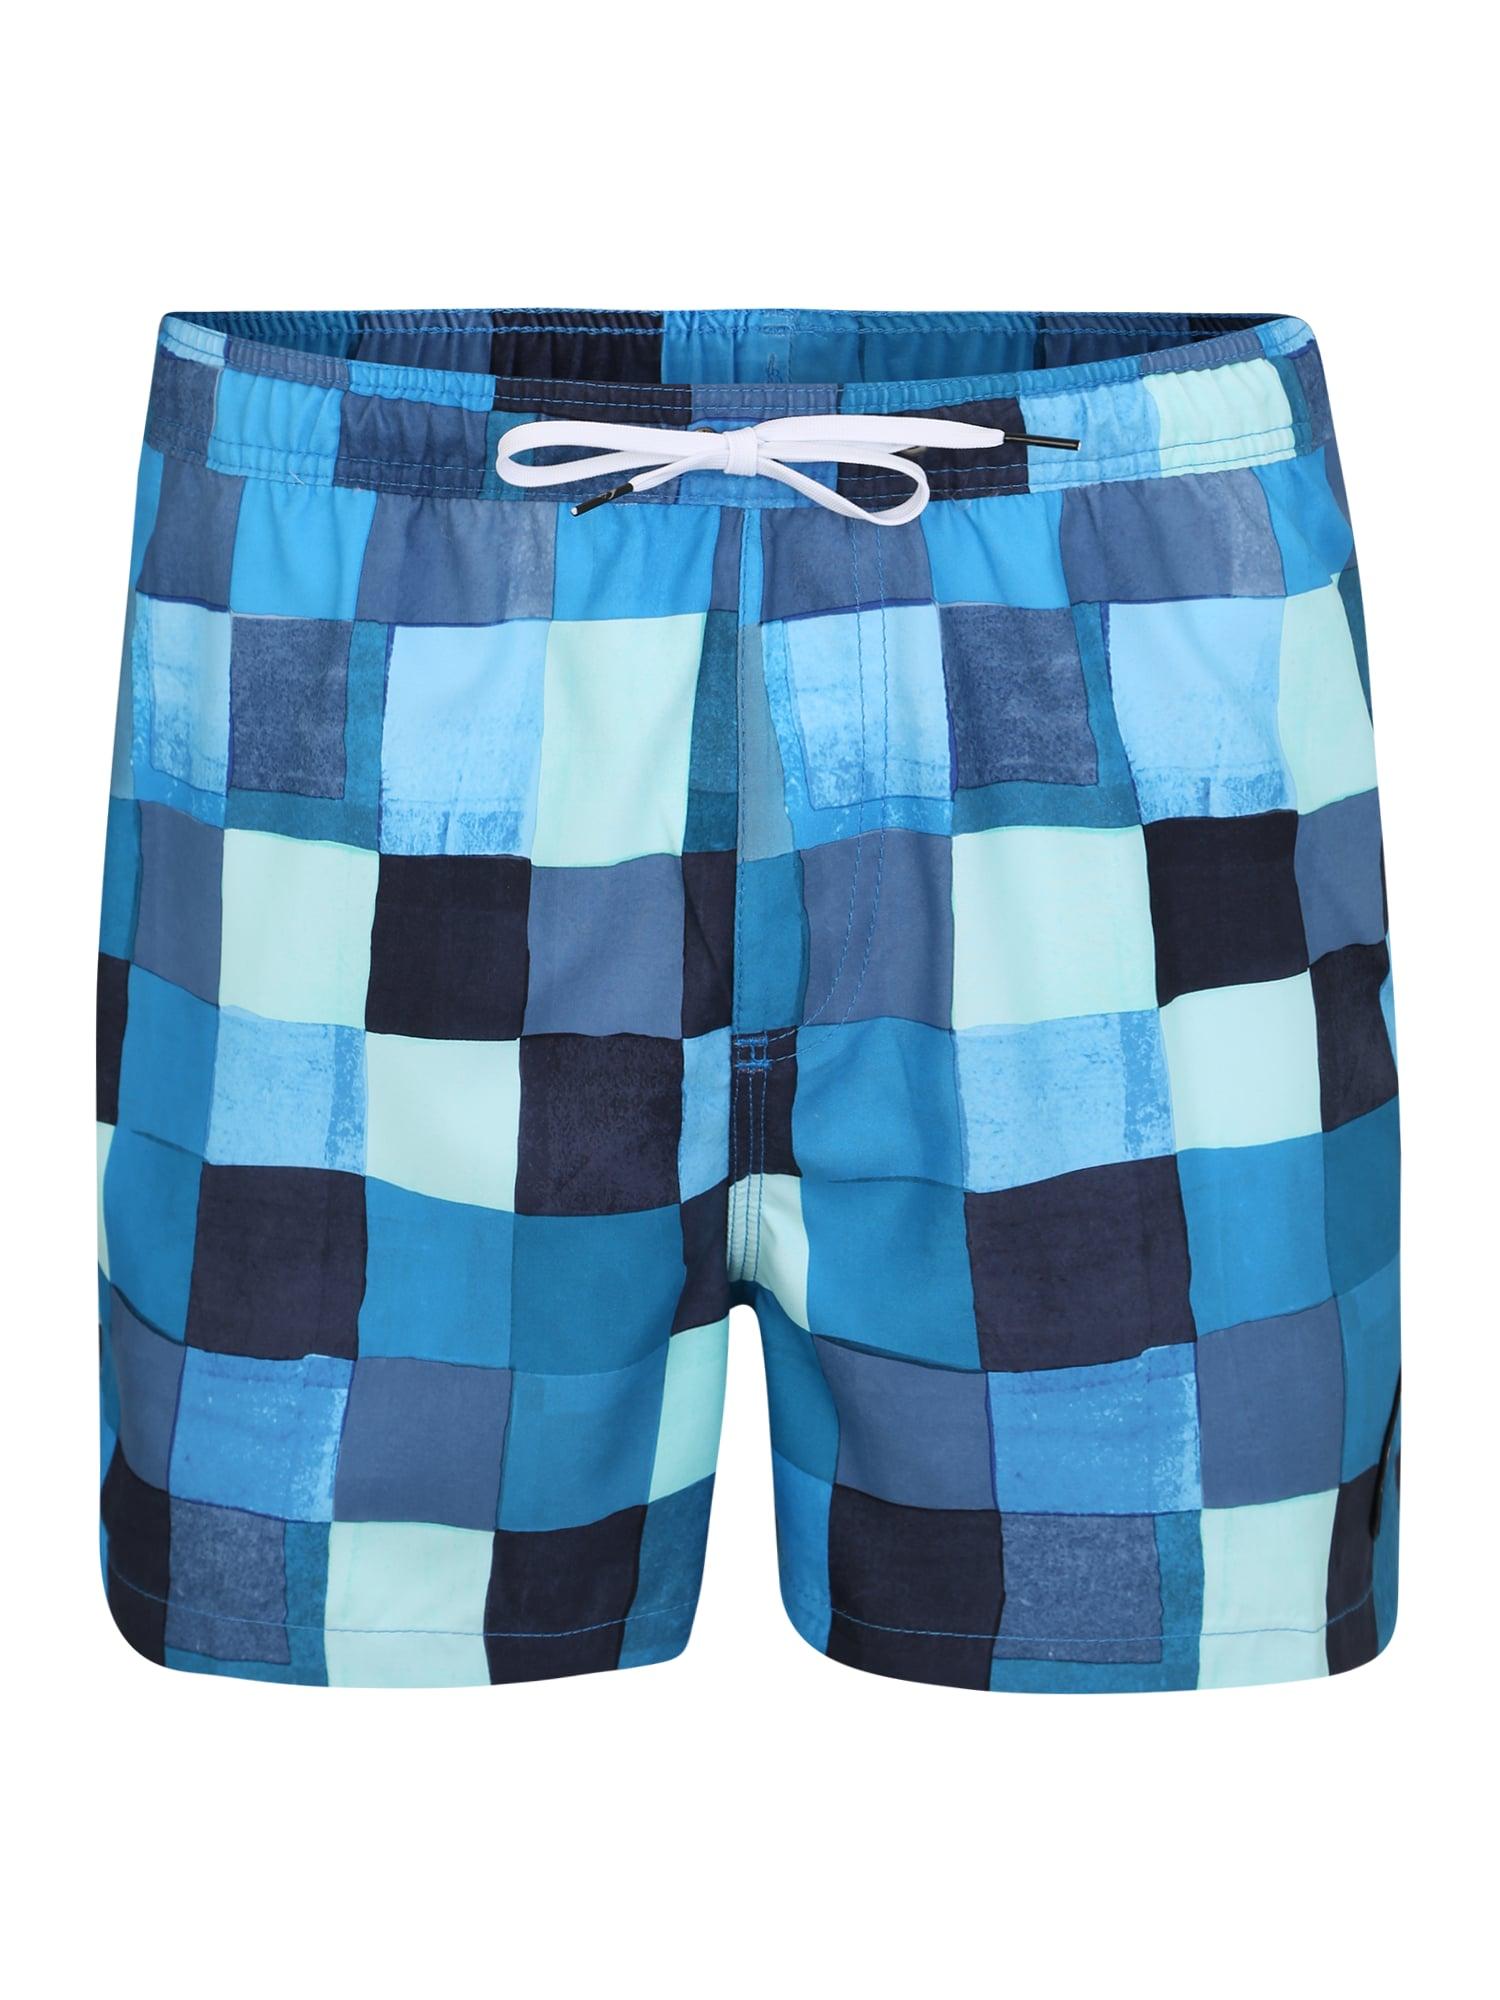 Plavecké šortky RESIN CHECK VOLLEY 15 modrá světlemodrá QUIKSILVER